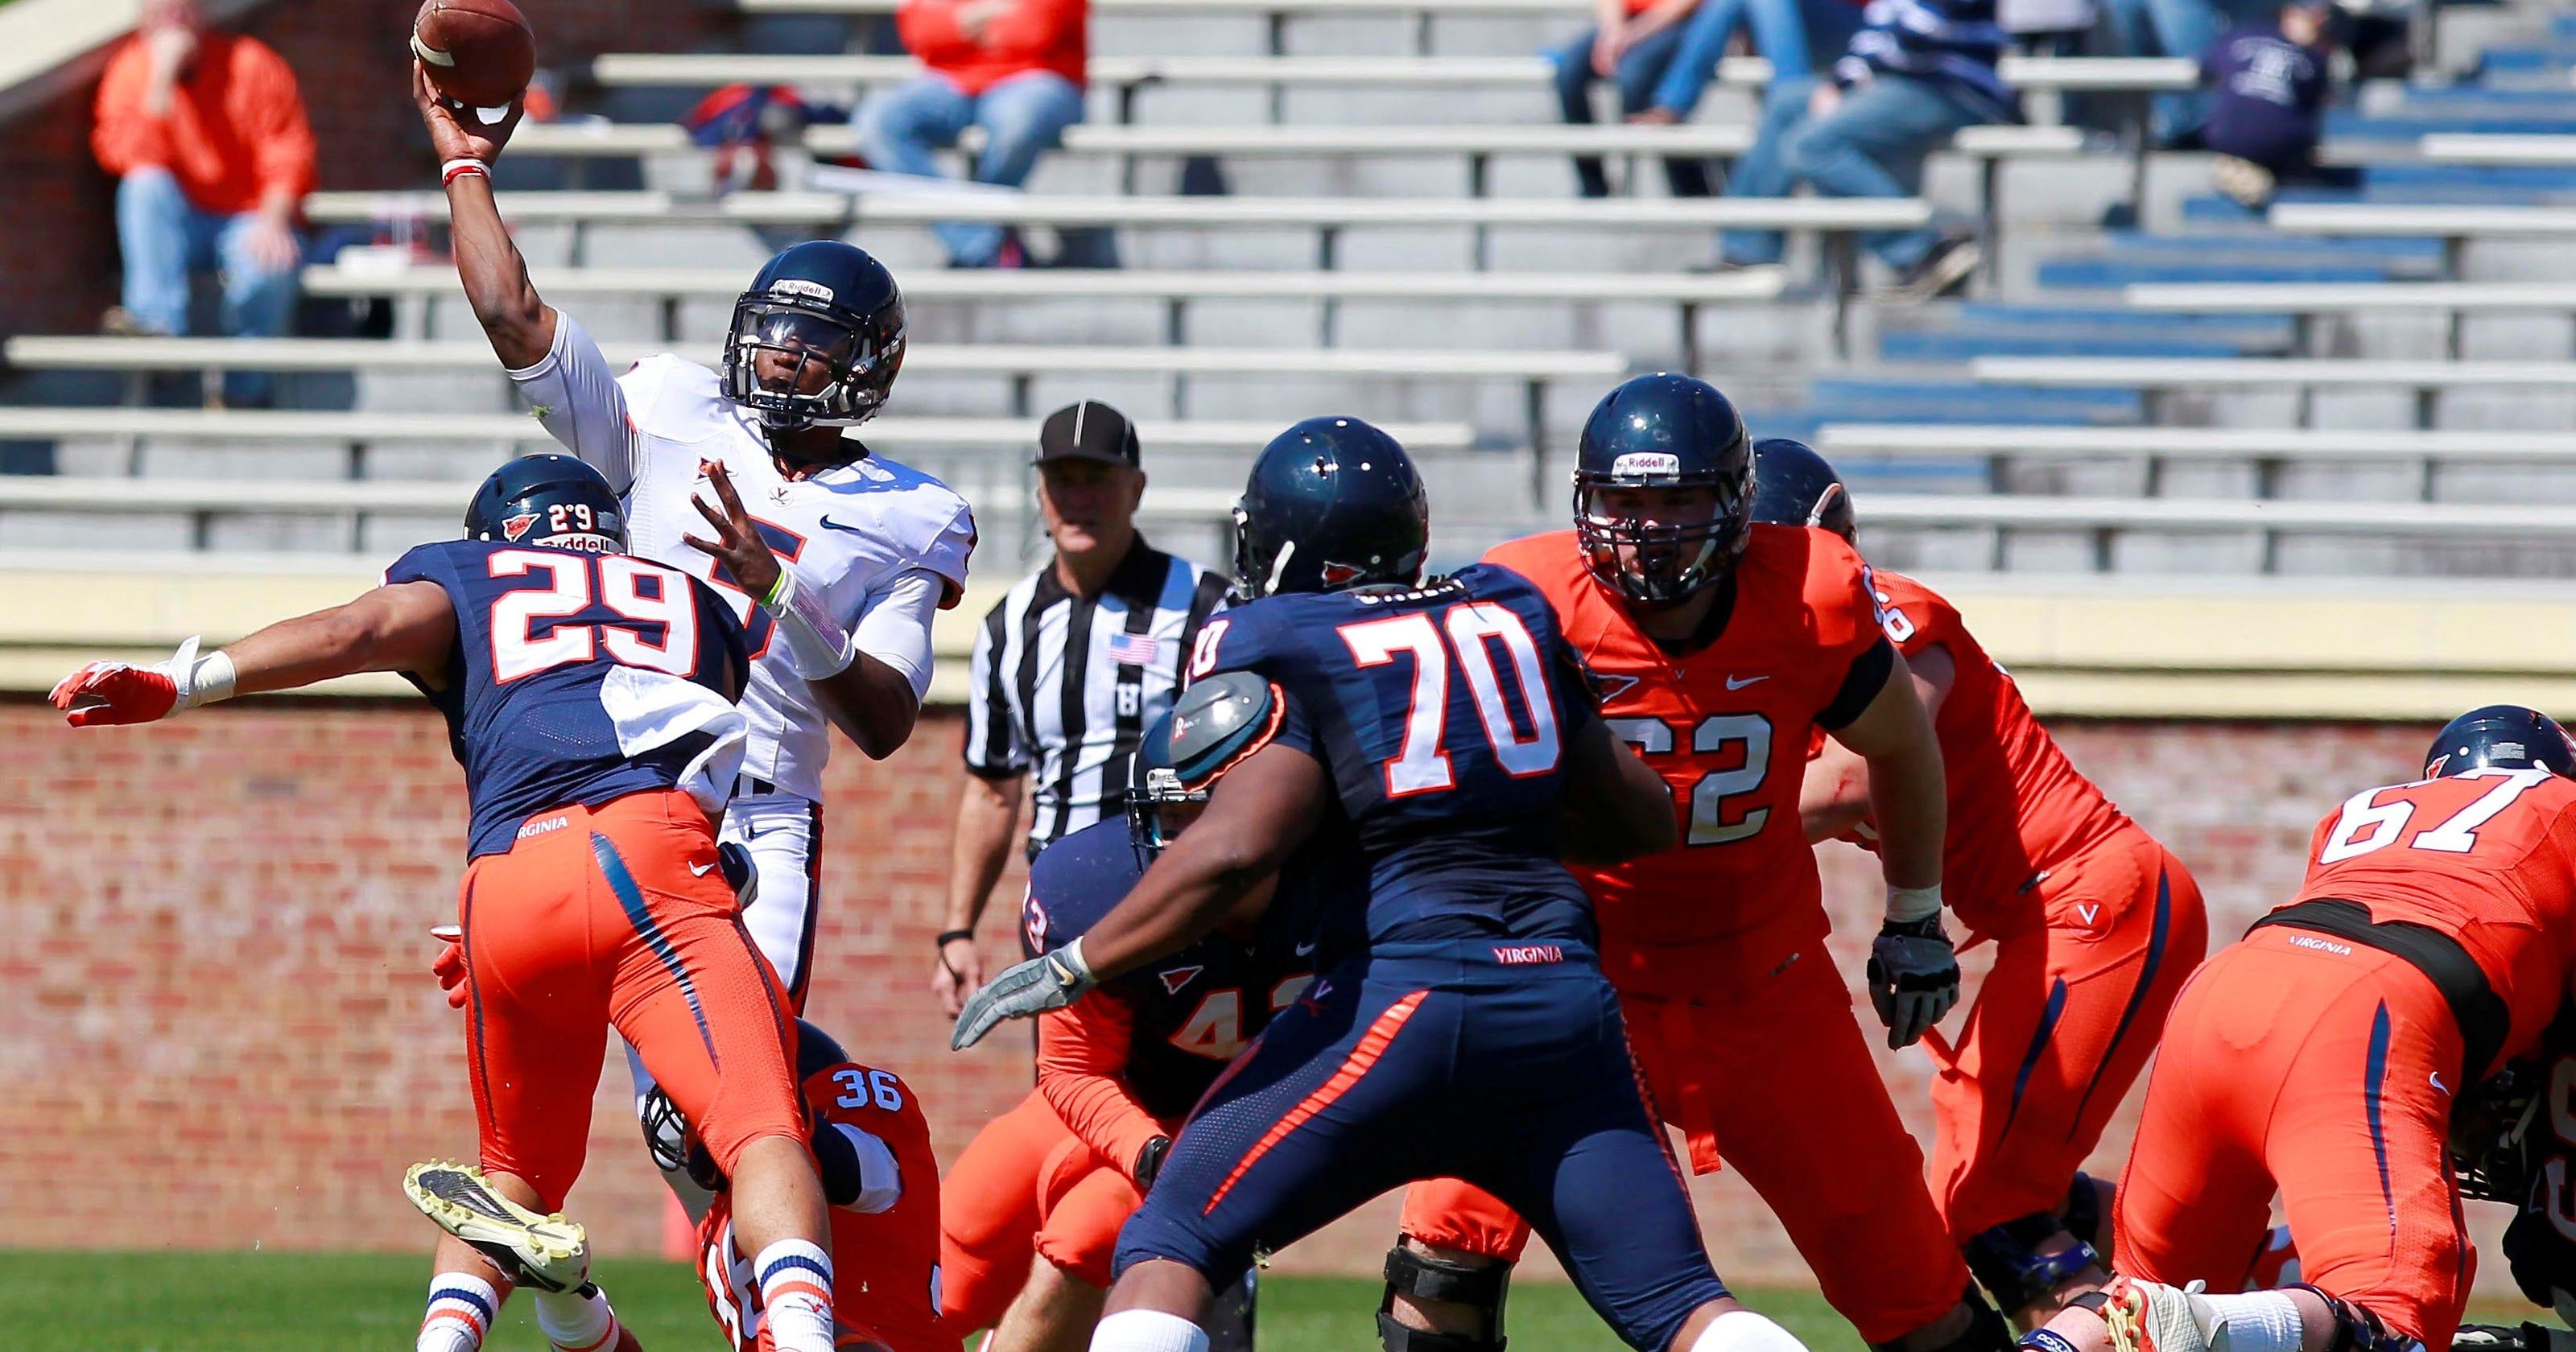 0edcf1377b0 2013 College football countdown | No. 78: Virginia